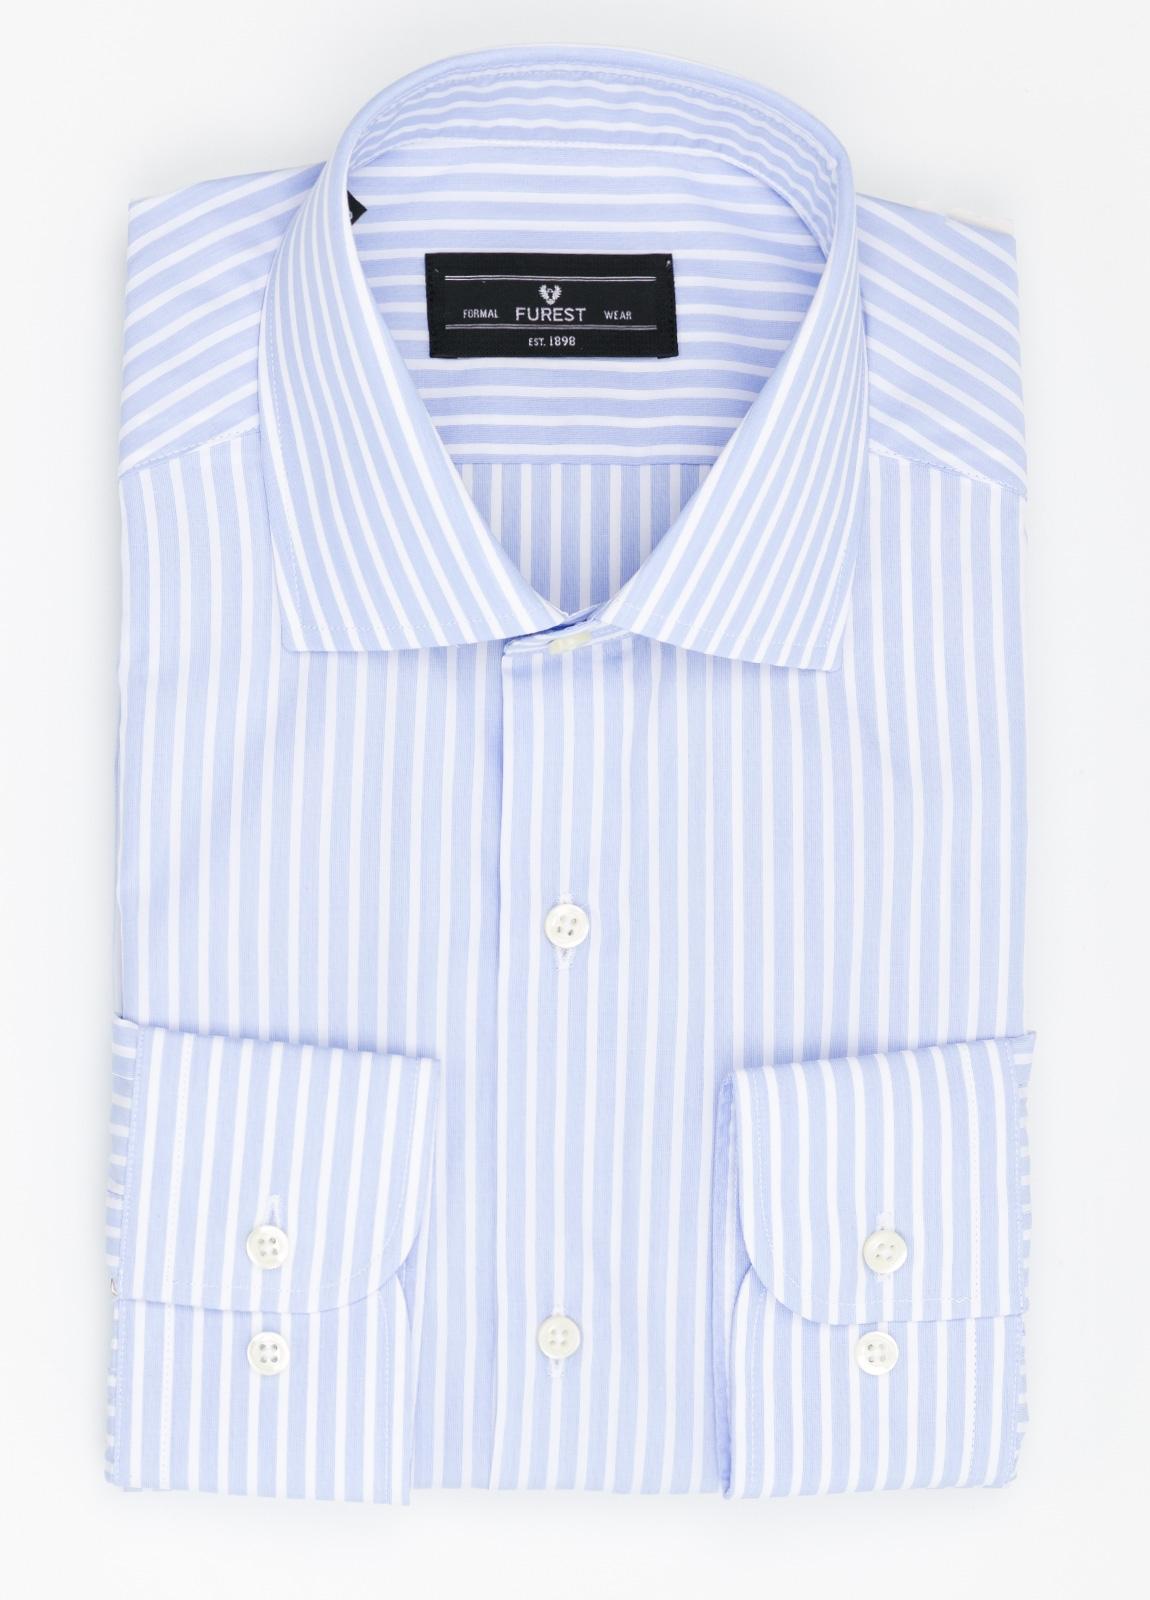 Camisa Formal Wear REGULAR FIT cuello italiano modelo TAILORED NAPOLI diseño de rayas color celeste, 100% Algodón.